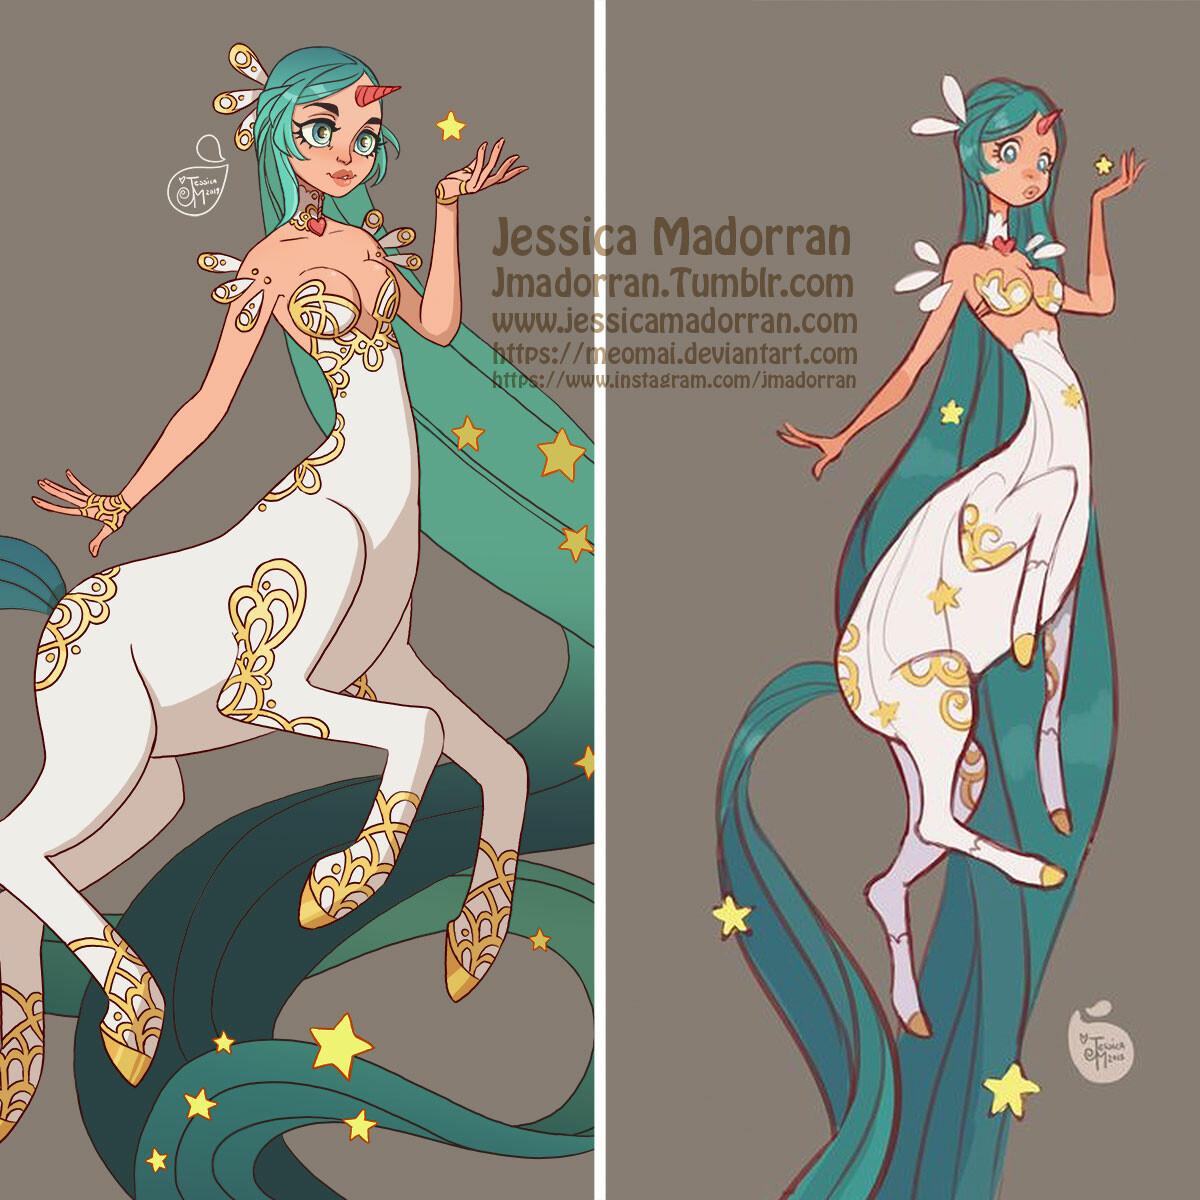 Jessica madorran character design redesign blue hair star centaur 2019 square comparison version artstation 02